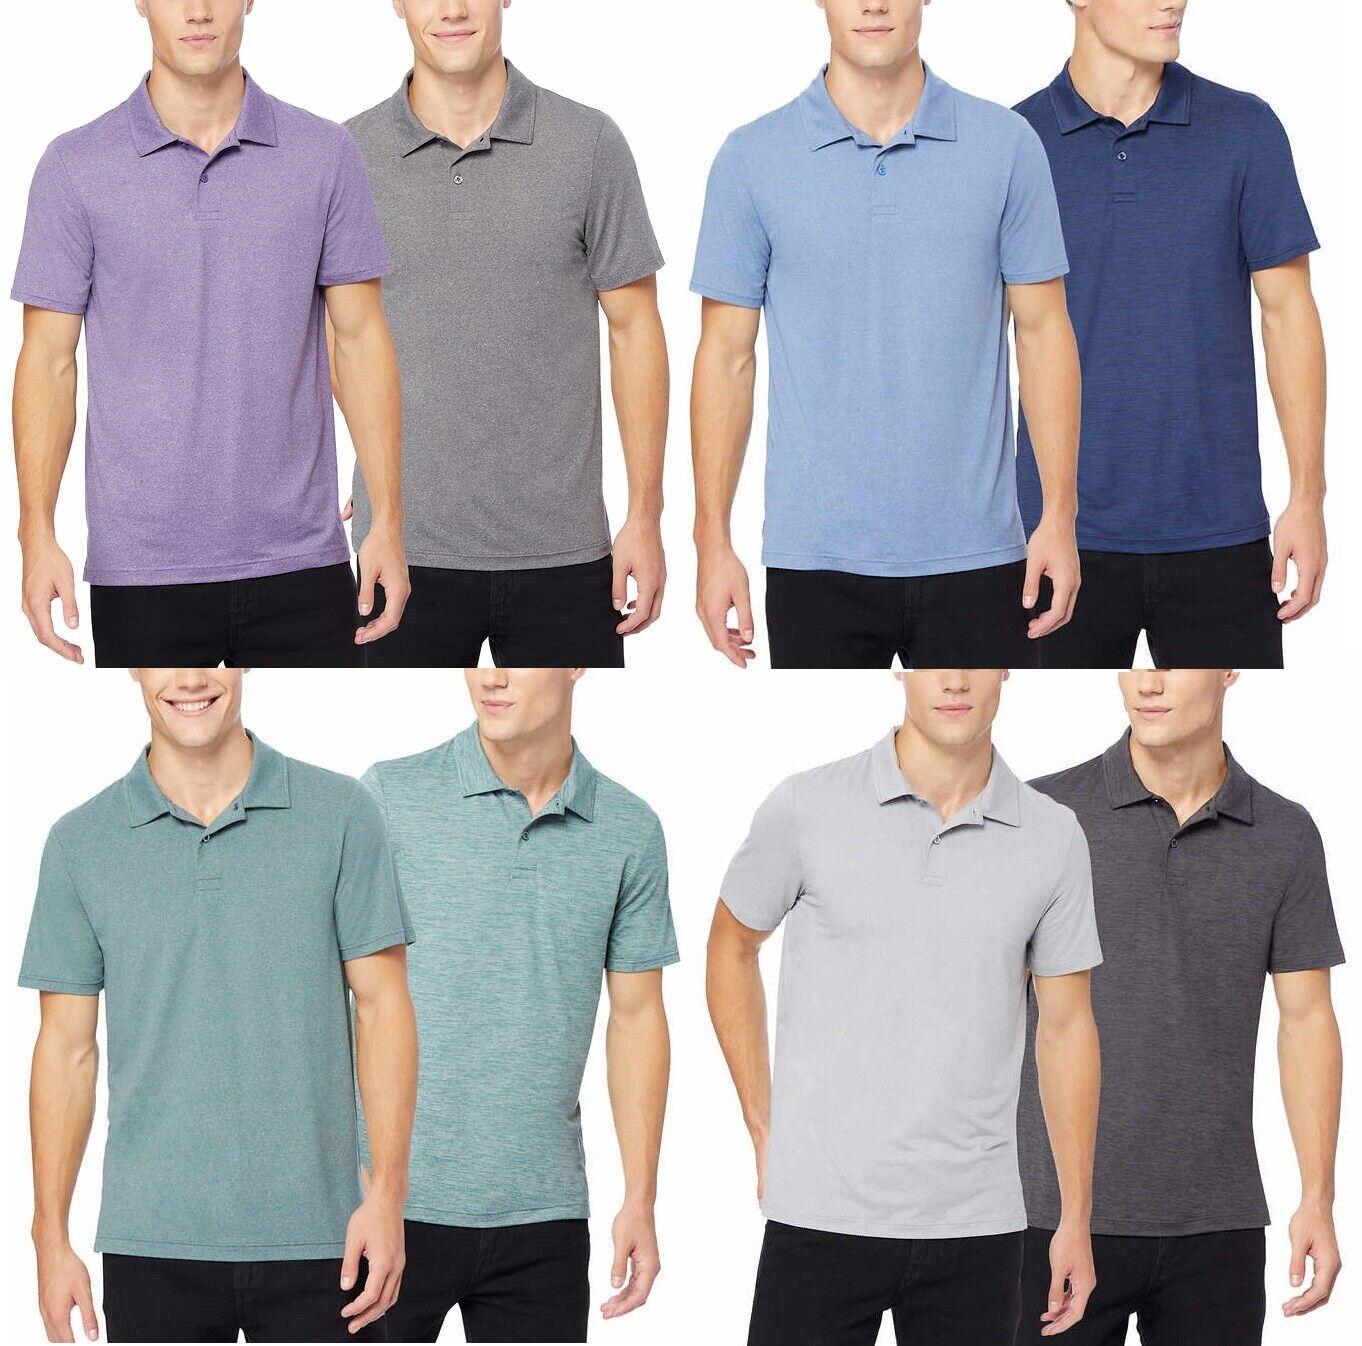 32° Degrees Cool Men's Performance Short Sleeves Polo Shirt